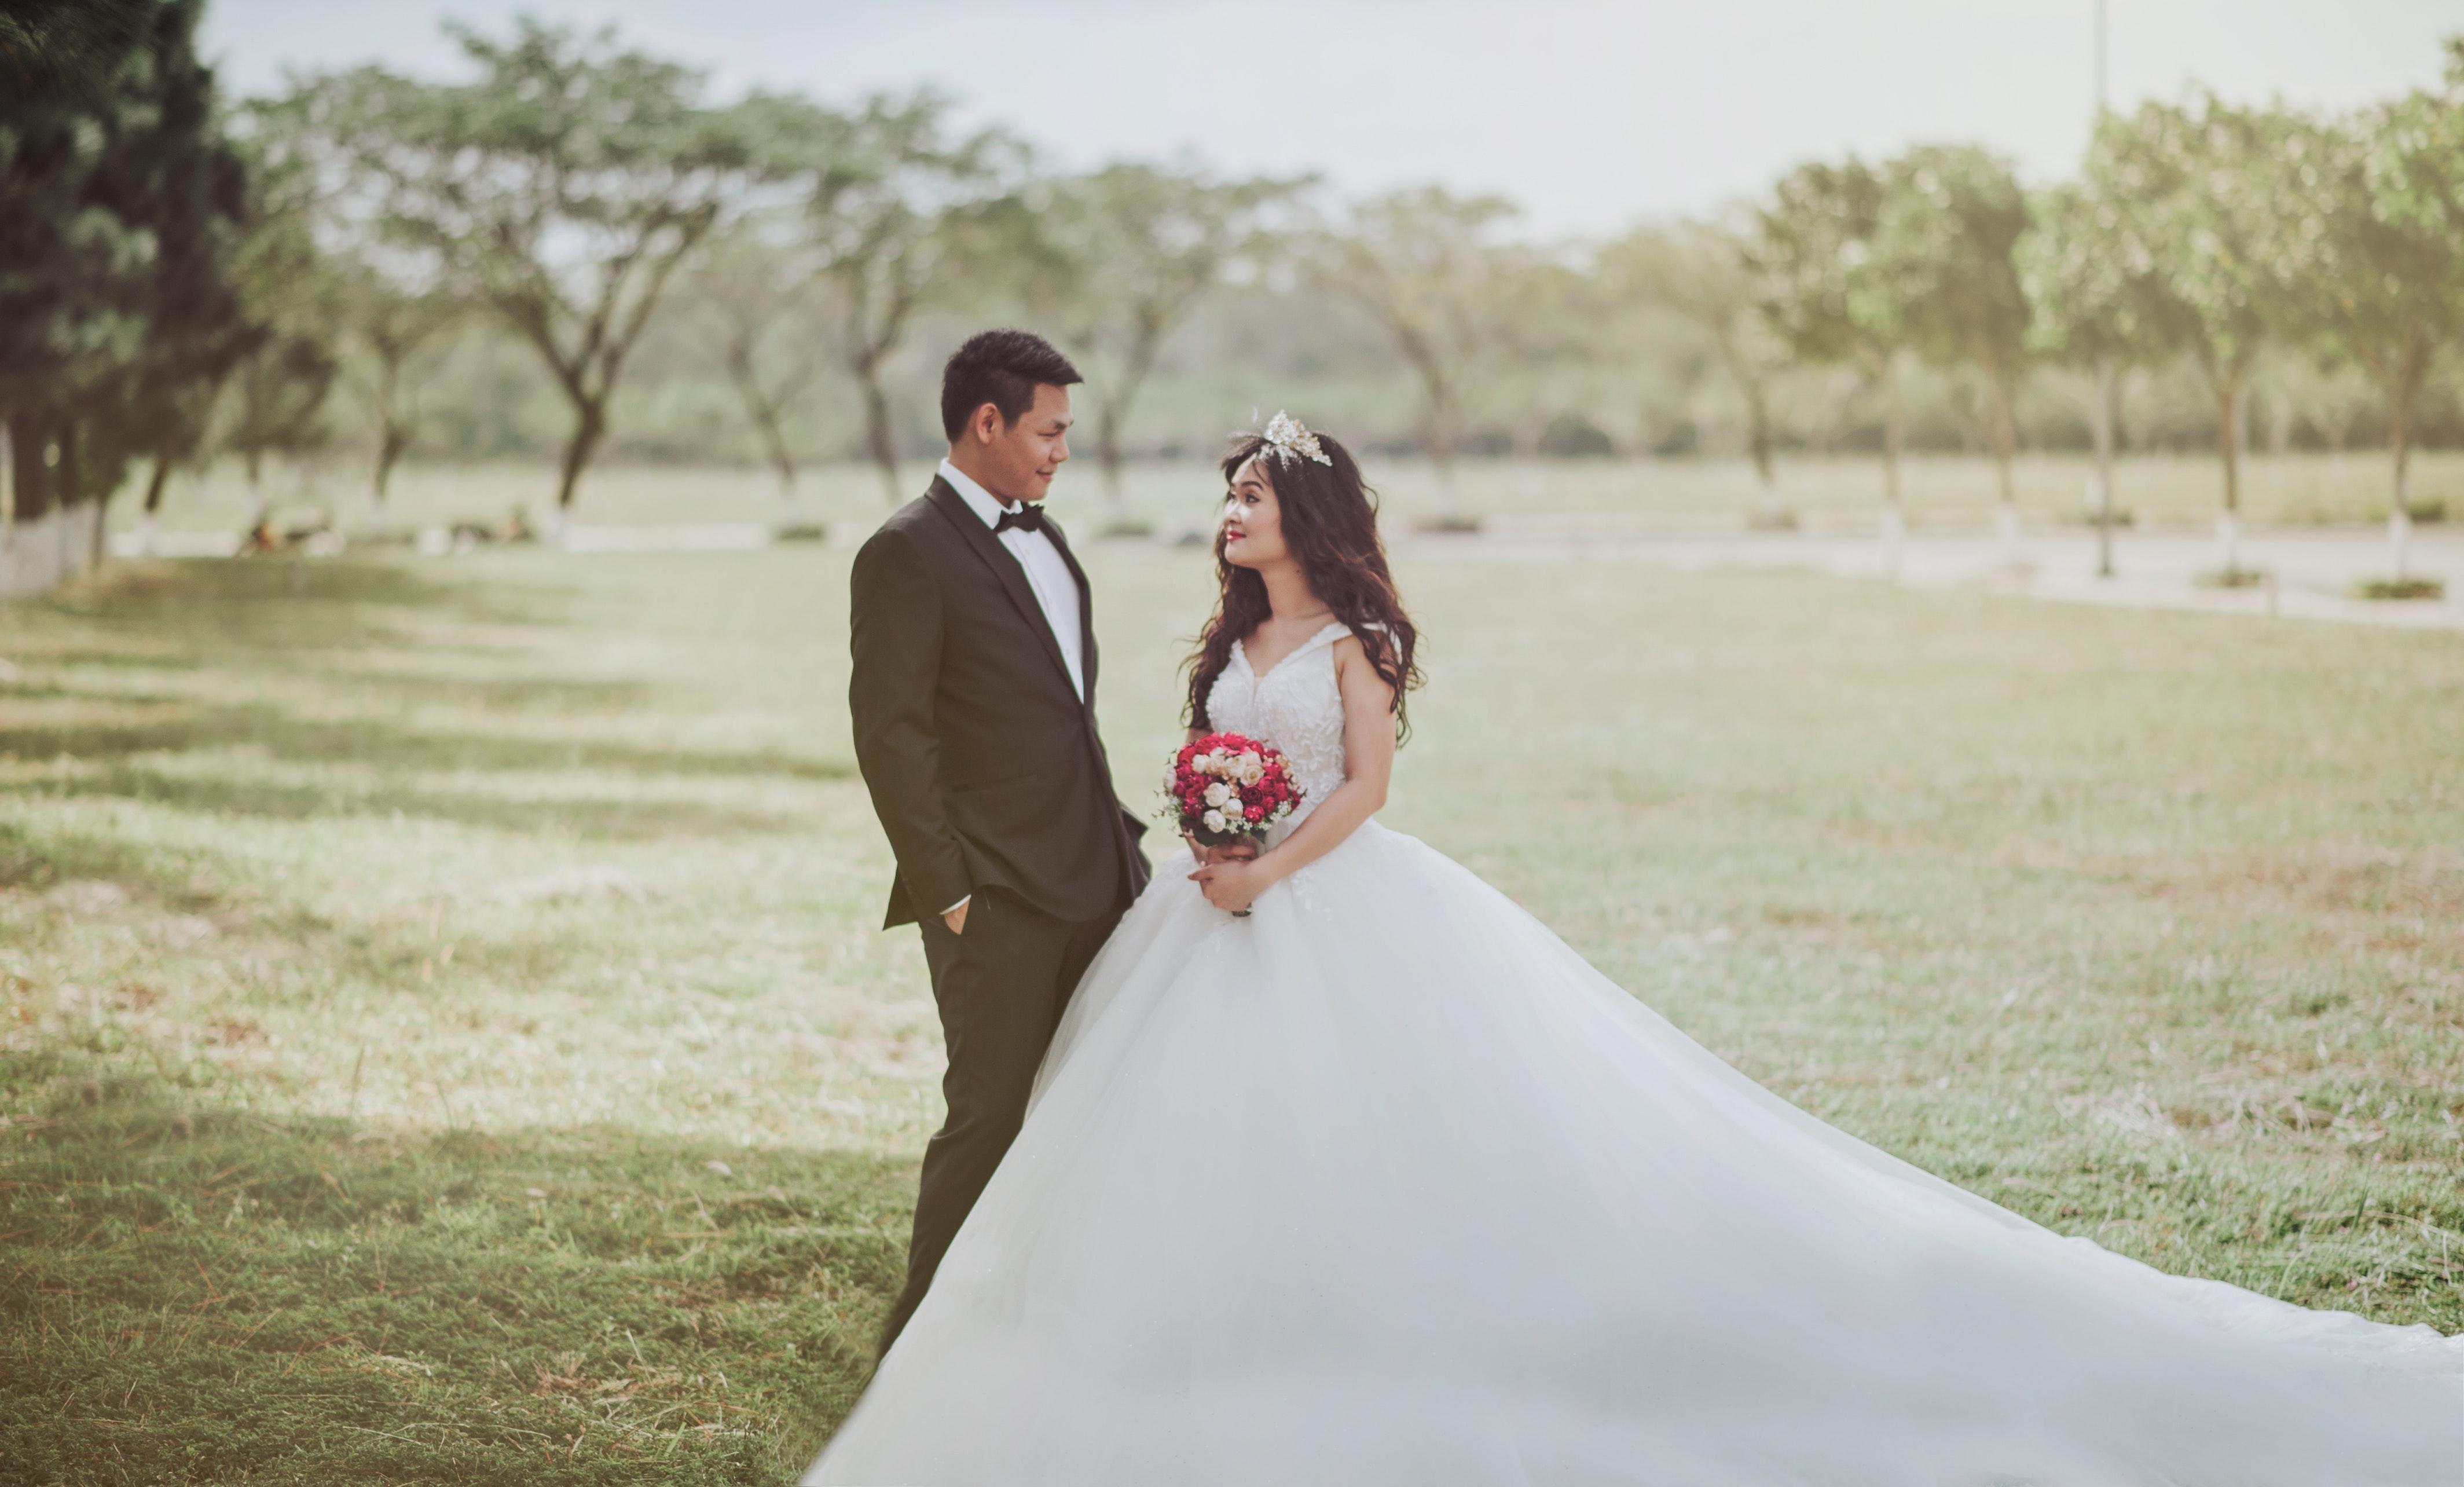 Free photo: Woman Wearing Wedding Dress Standing Beside a Man ...